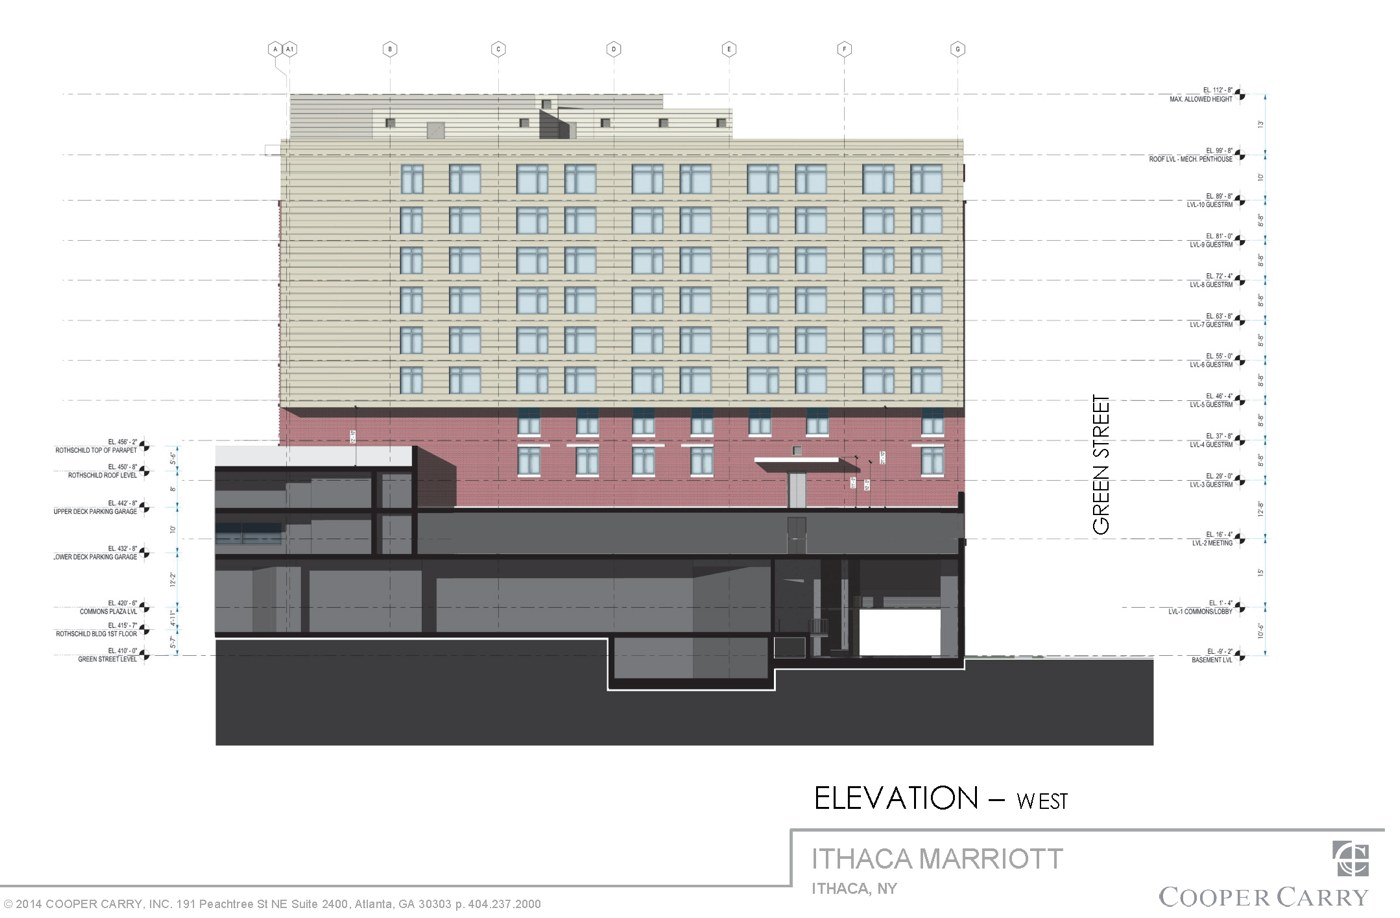 Marriott Hotel - Planning Board Presentation - 06-10-14_Page_4